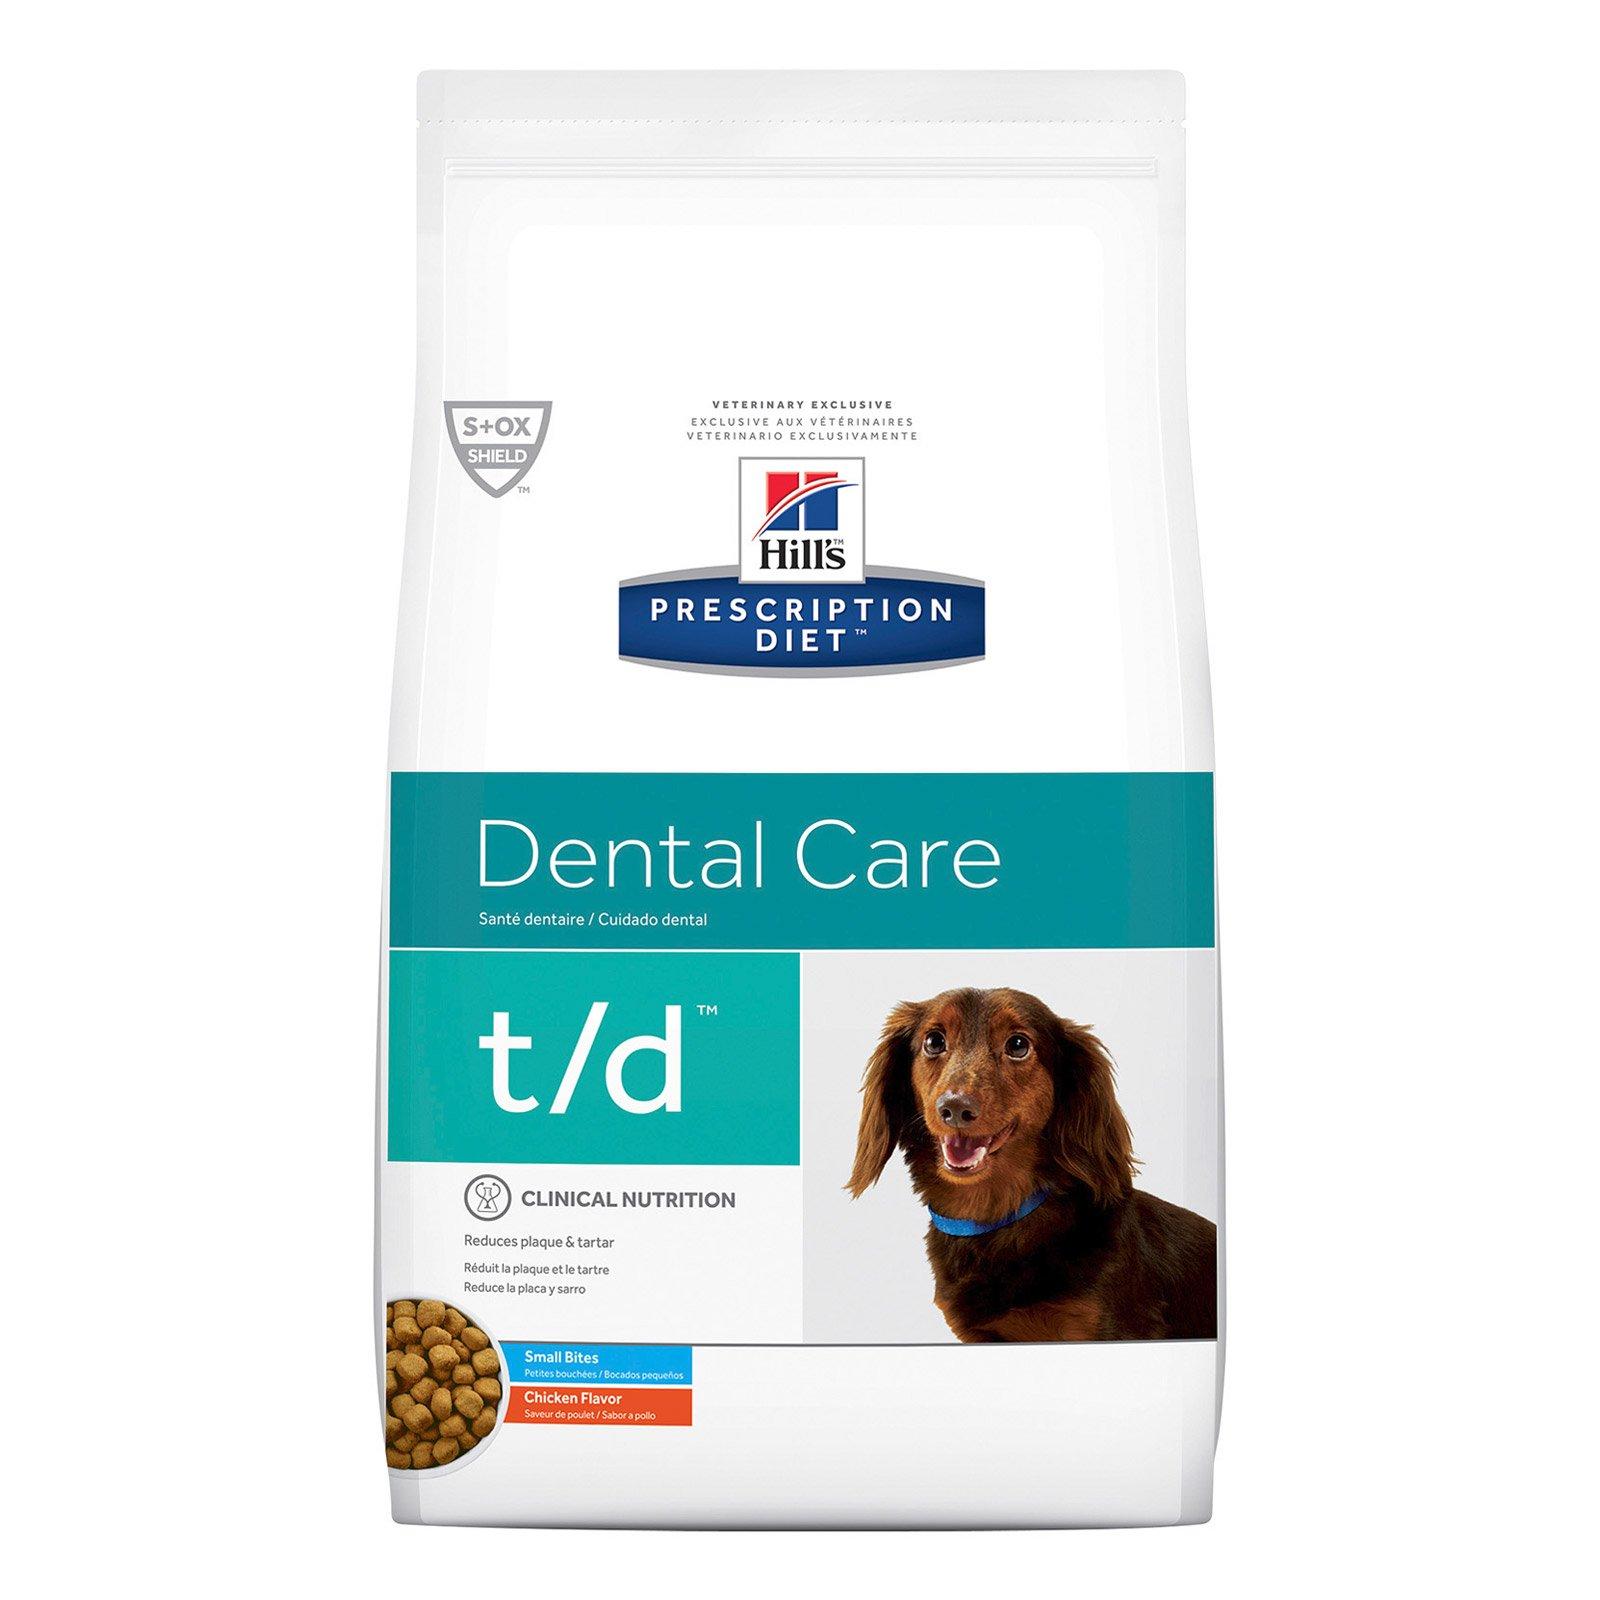 Hill's Prescription Diet t/d Small Bites Dental Care Dry Dog Food